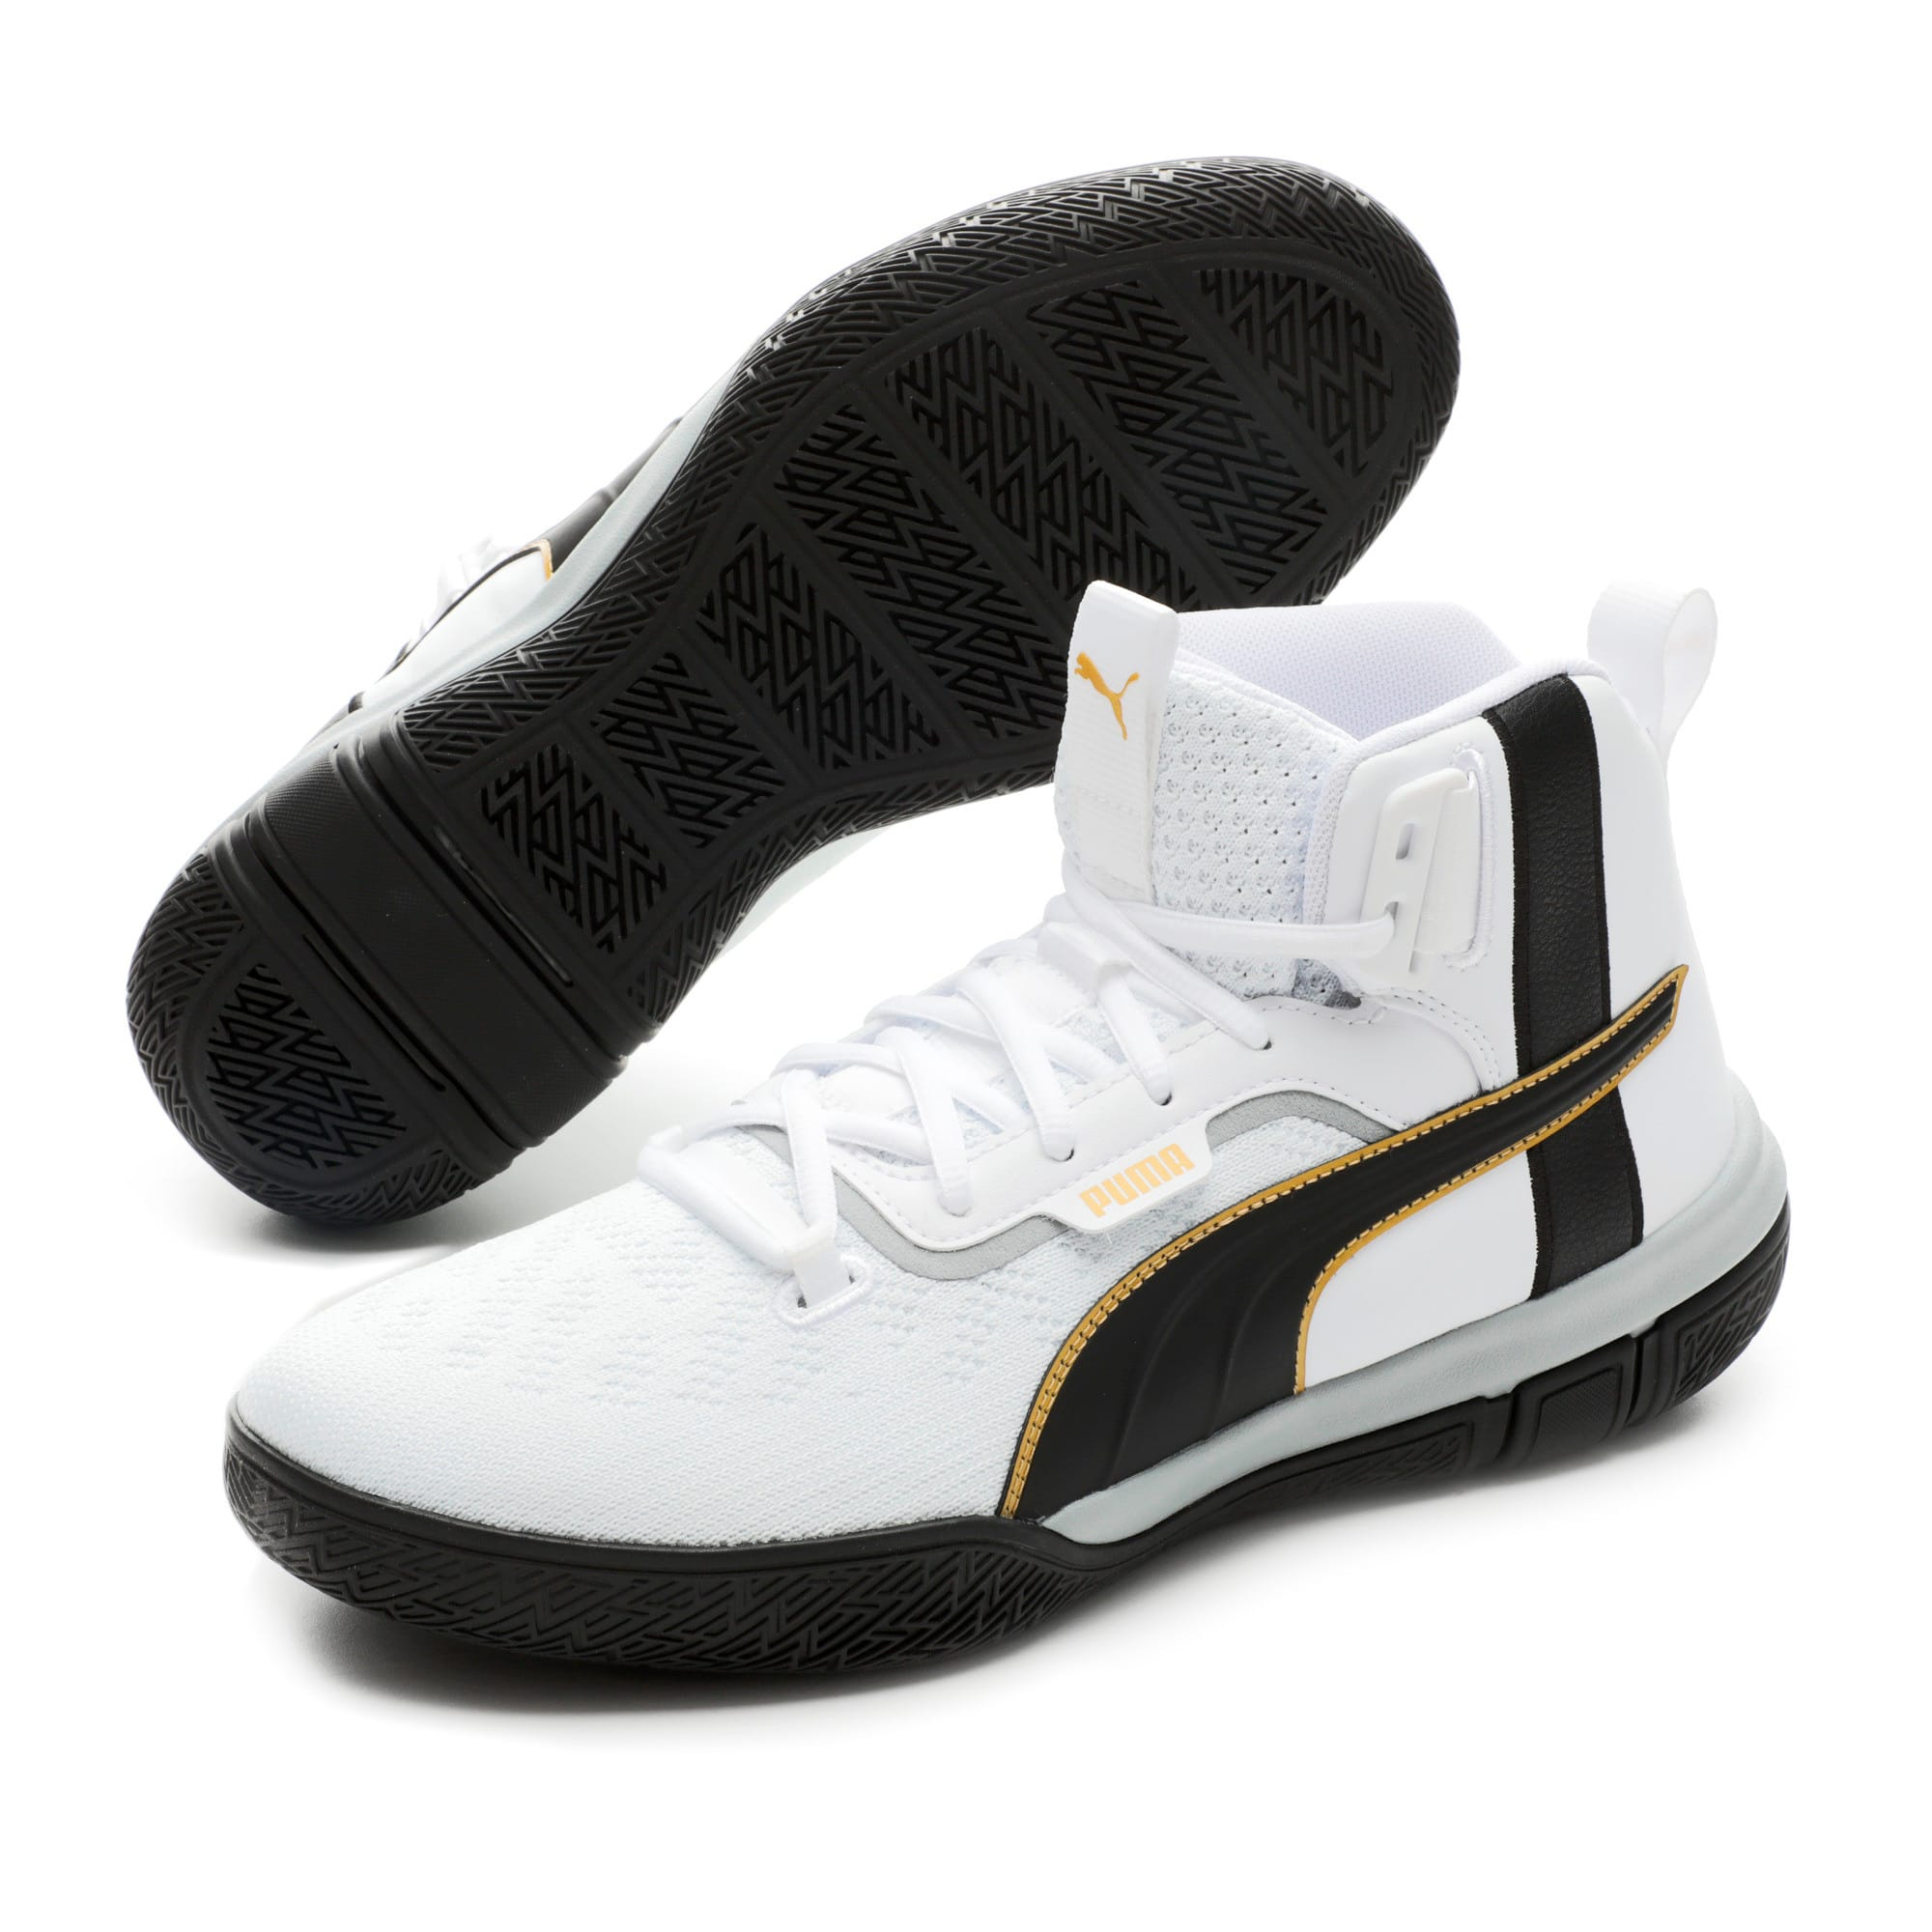 Thumbnail 2 of Legacy '68 Basketball Shoes, Puma Black-Puma White, medium-IND